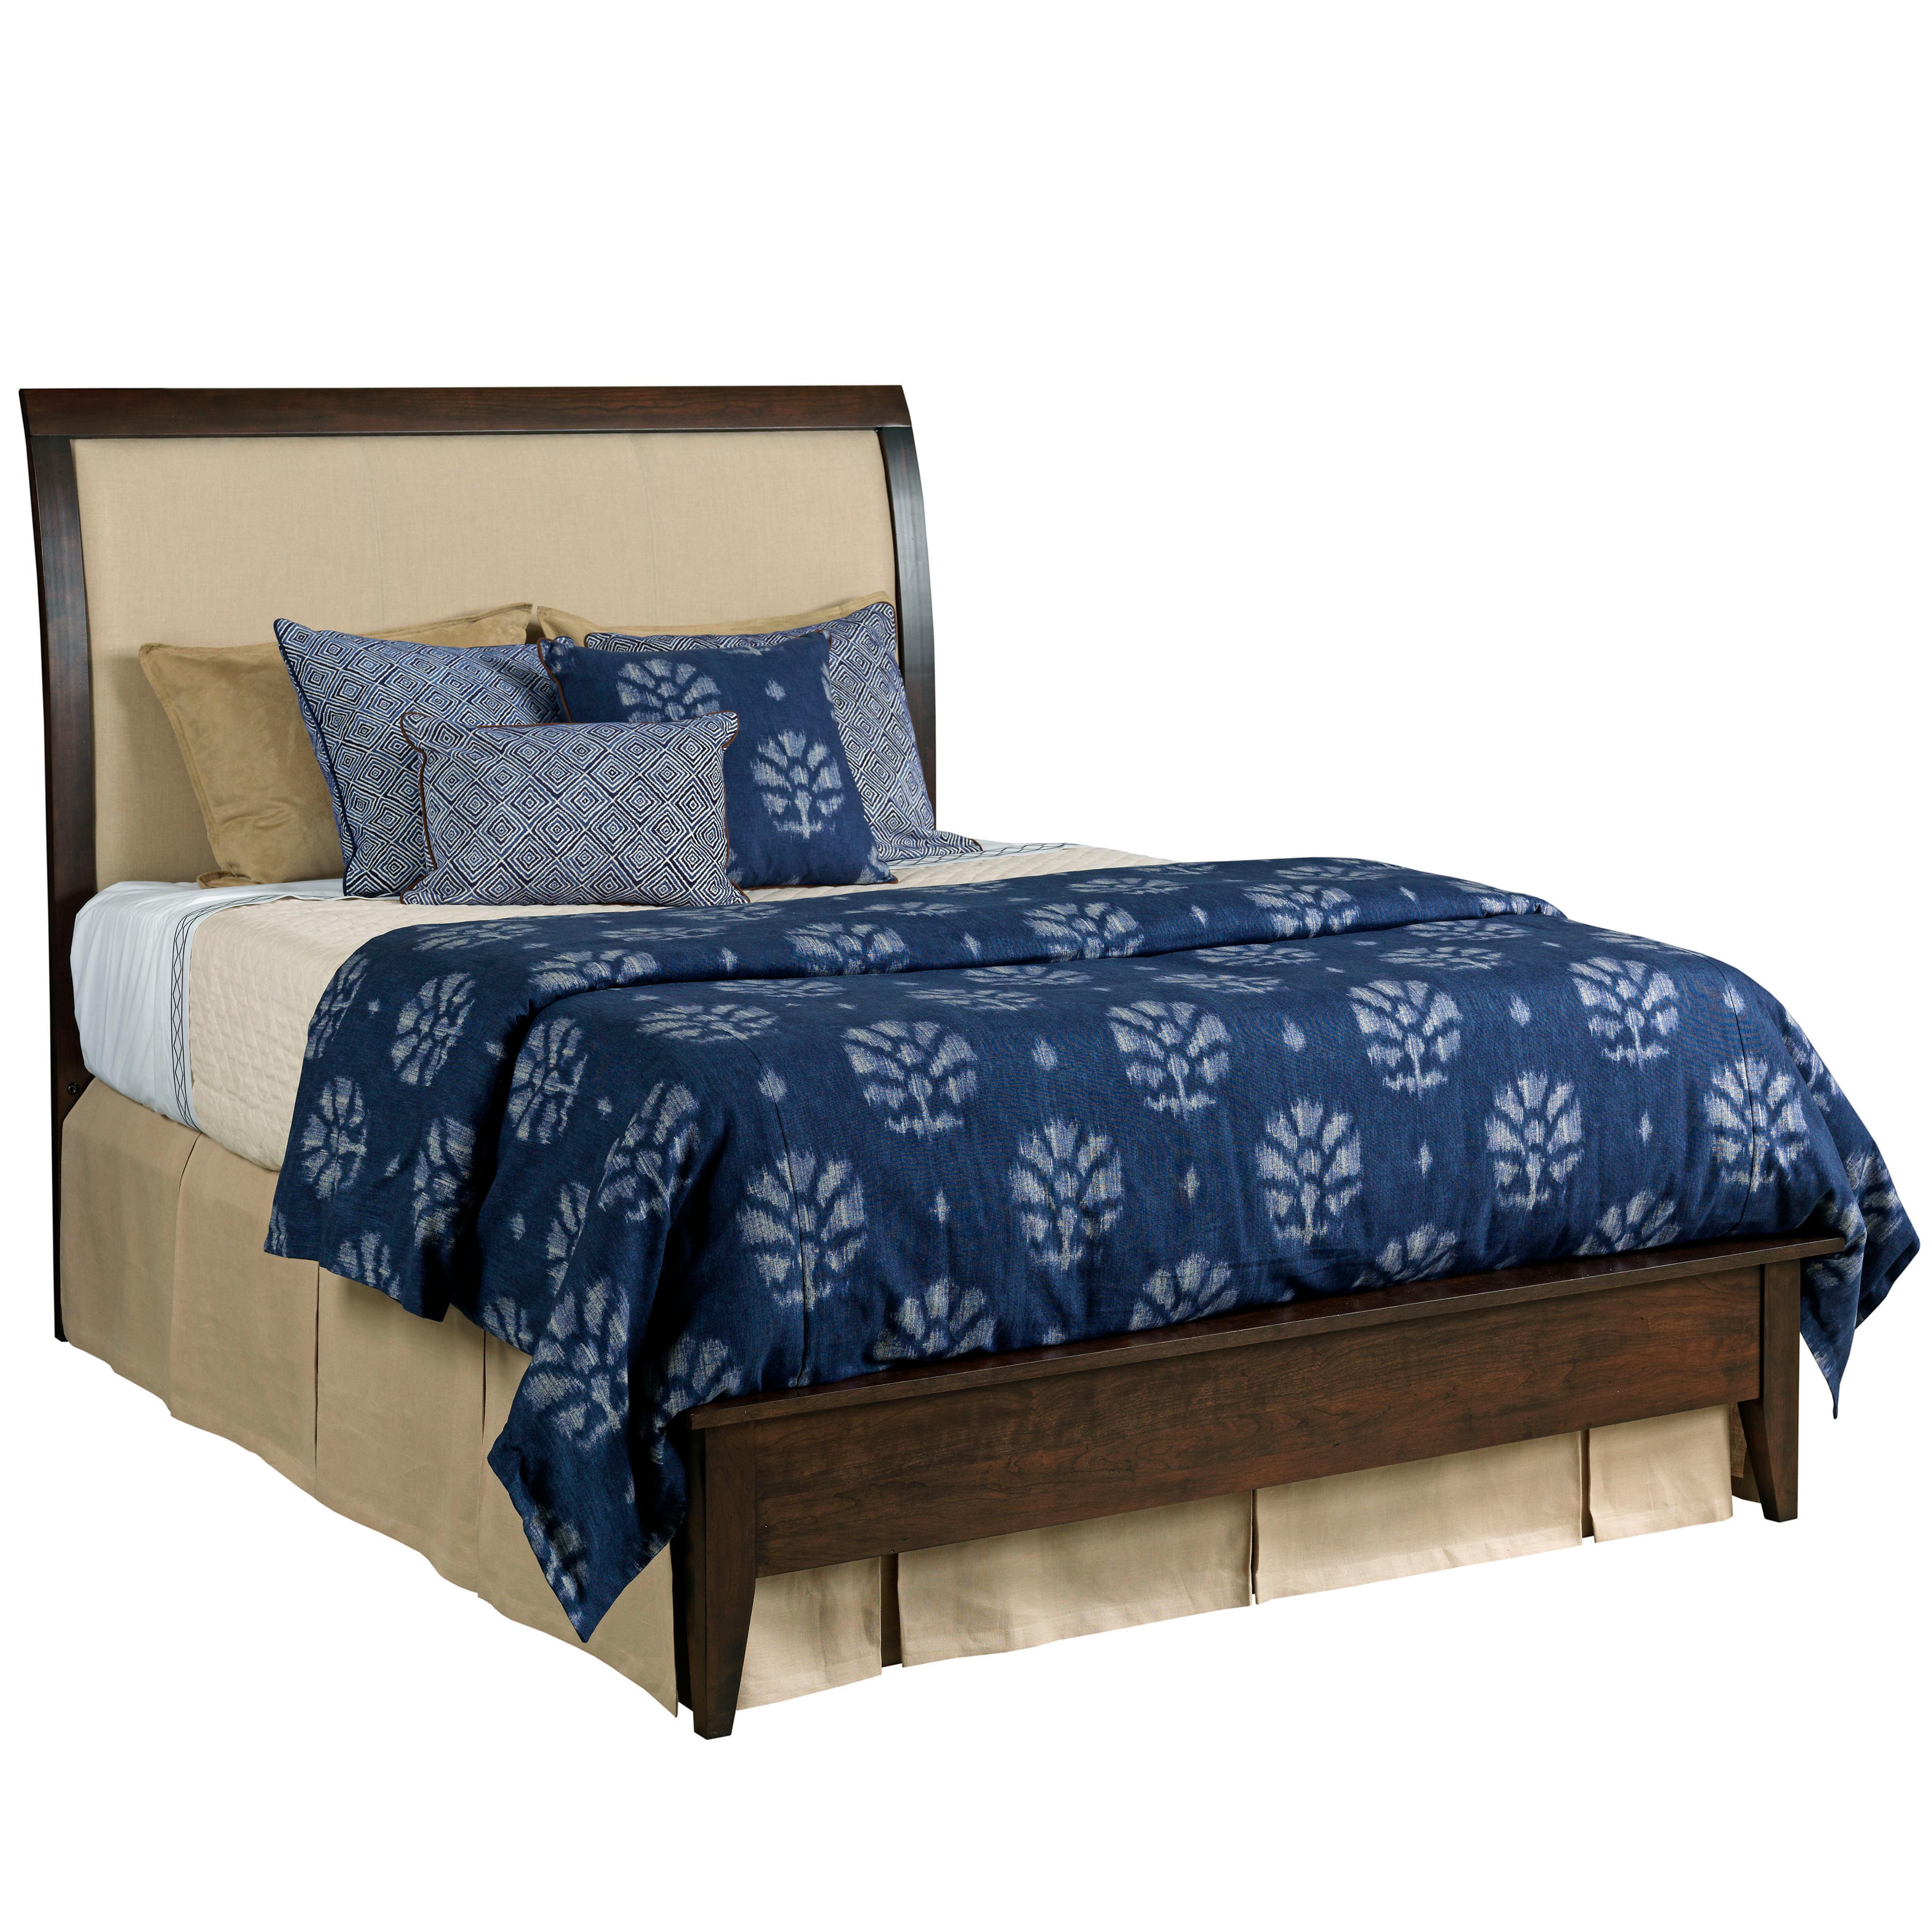 Kincaid Furniture Gatherings Queen Meridian Bed - Item Number: 44-2530